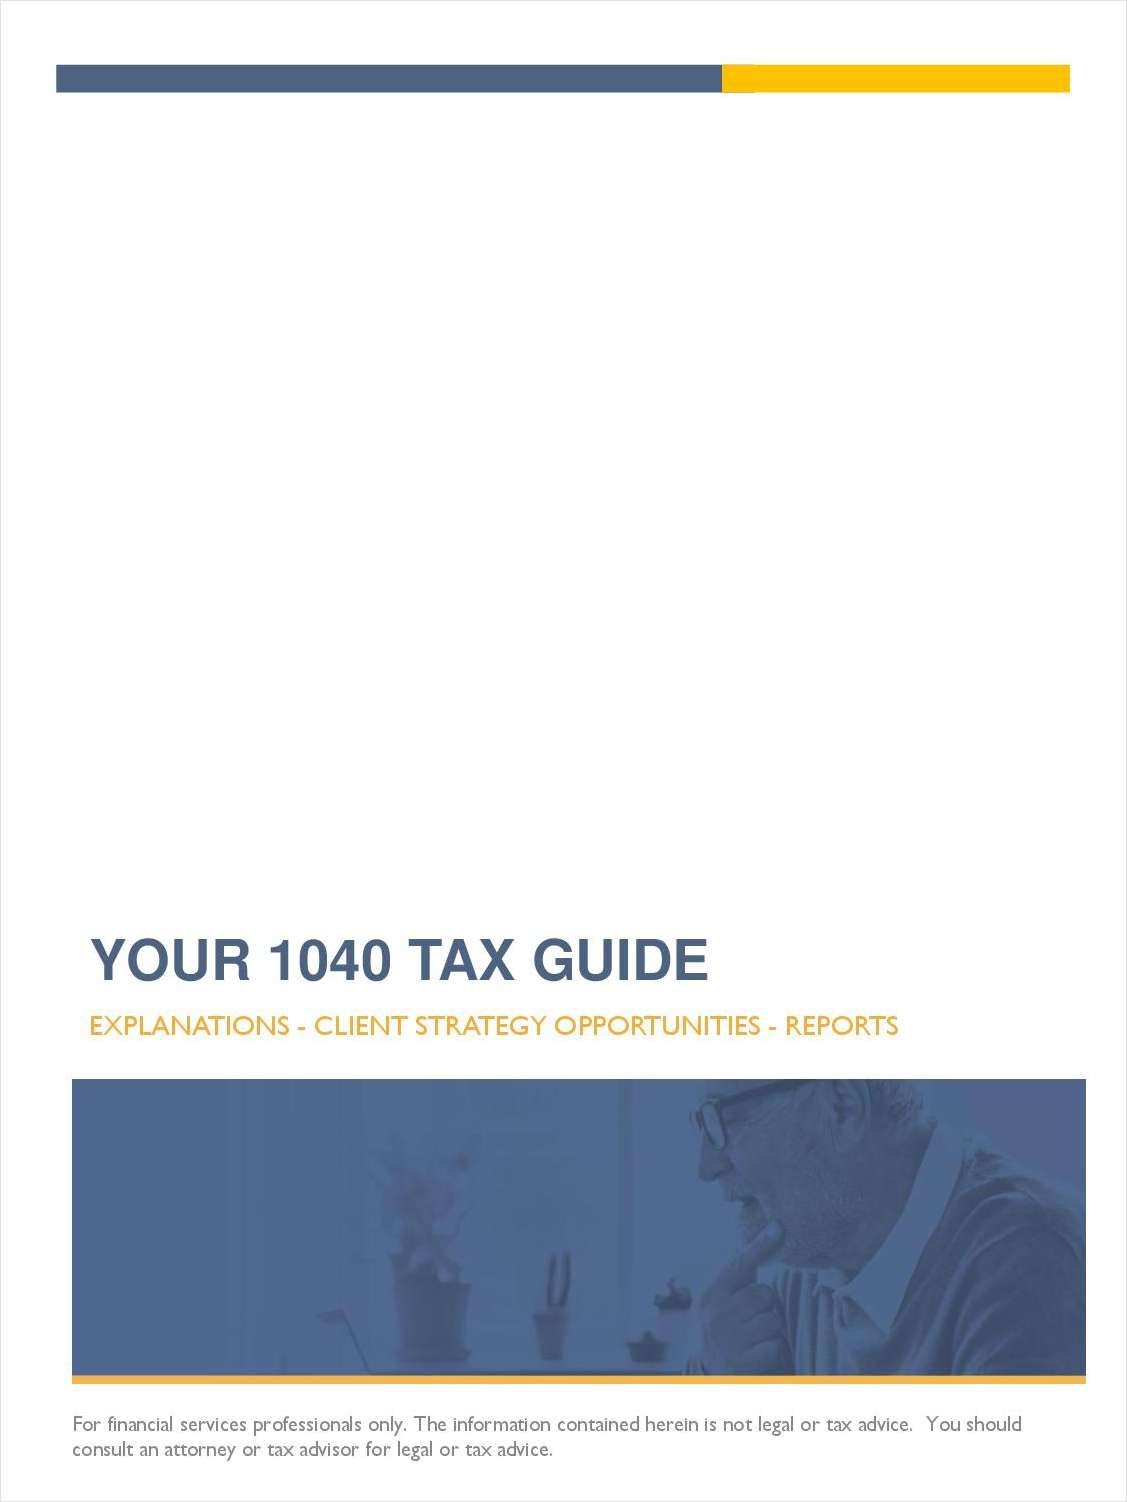 Your 1040 Tax Guide Cheat Sheet